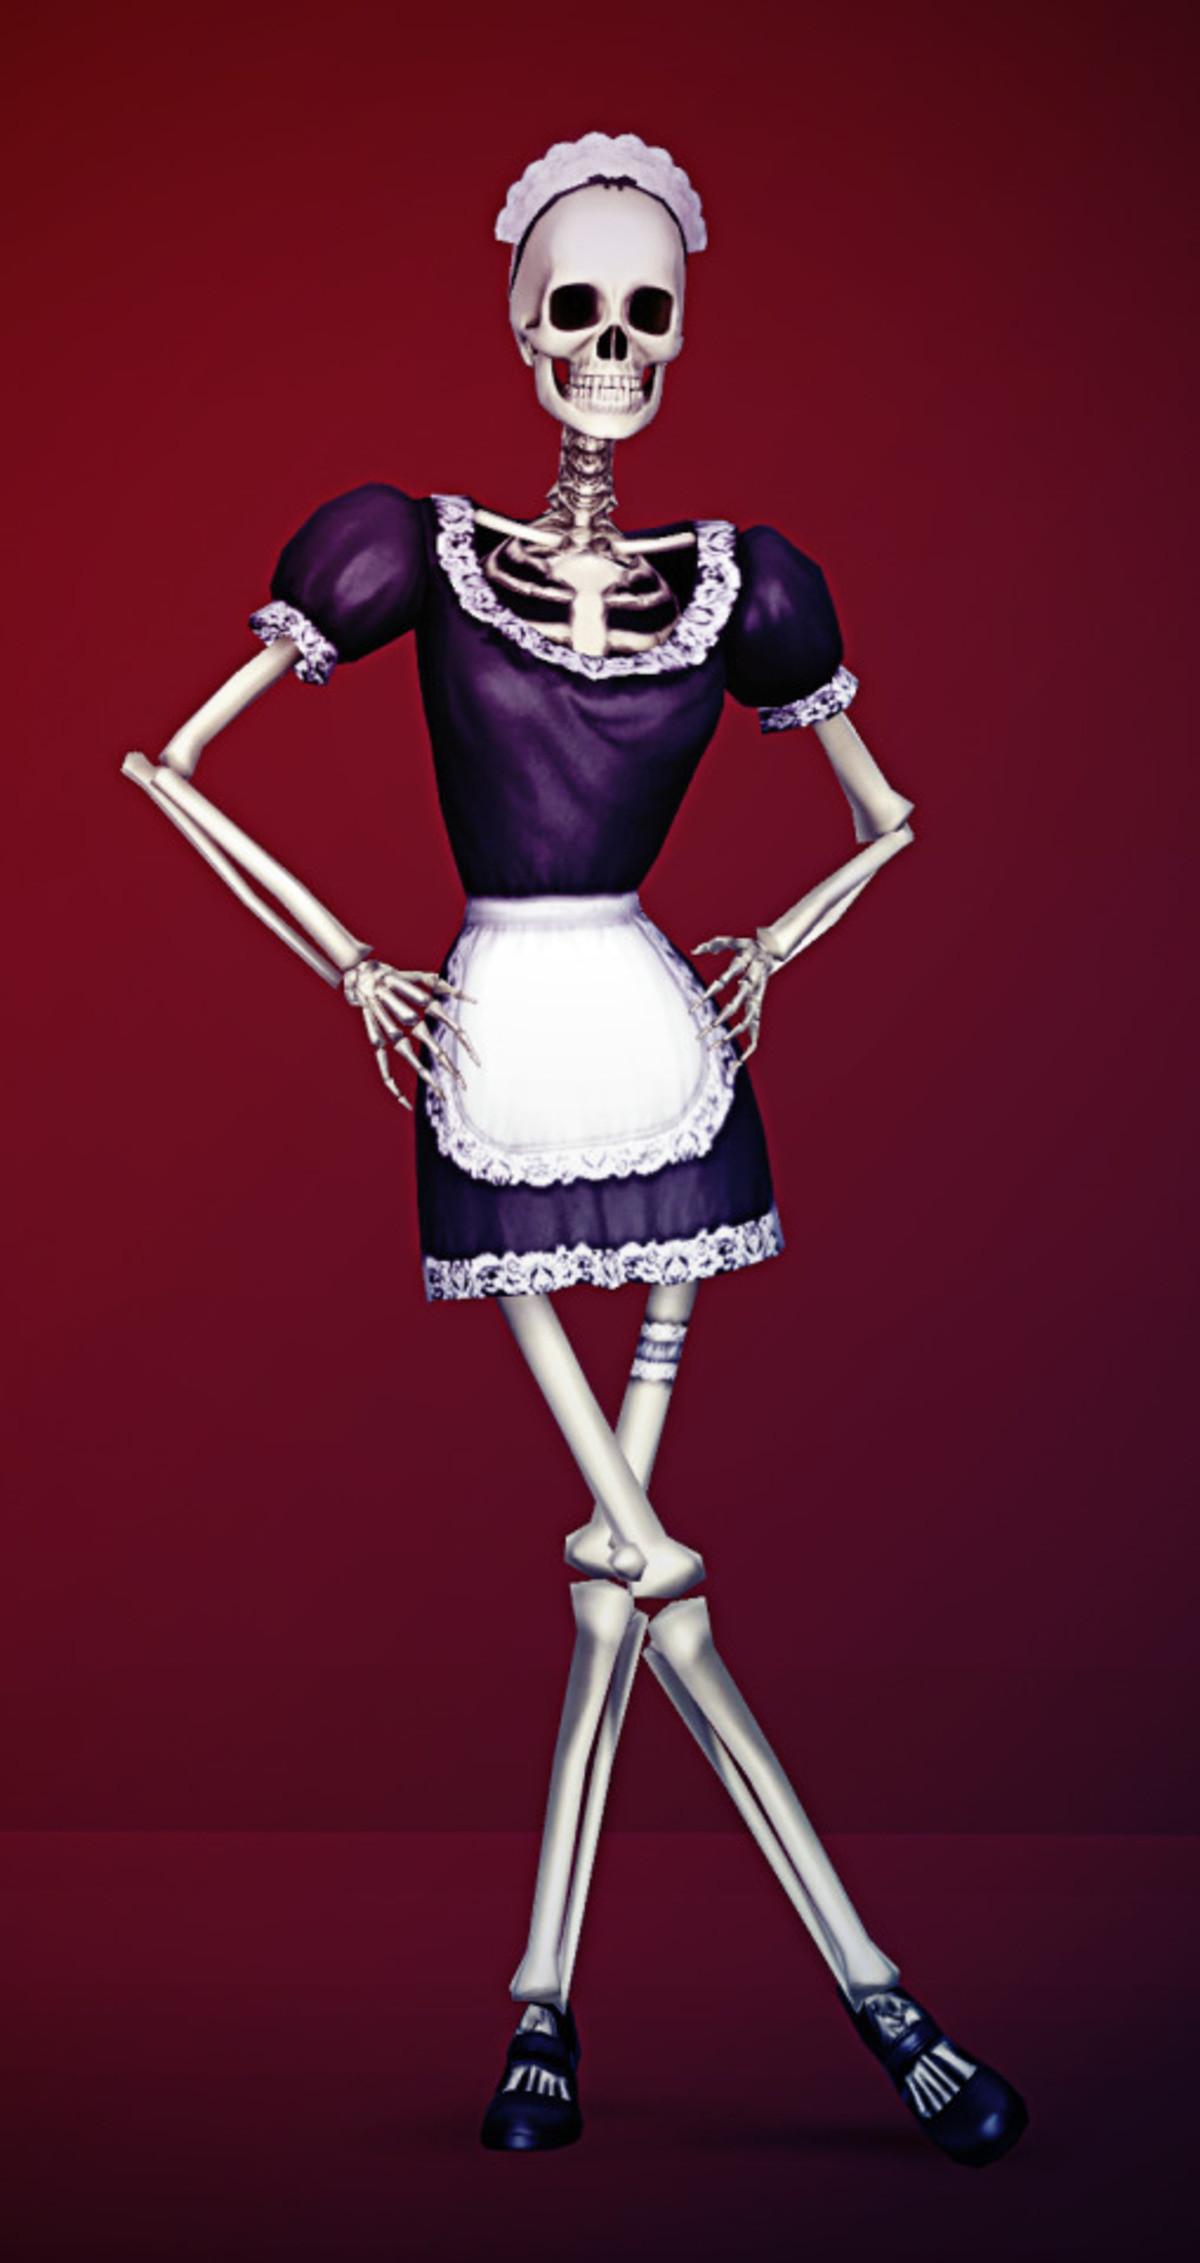 skeleton. join list: SplendidServants (494 subs)Mention History join list:. mangyblacksheep inspired this by summoning me for this earlier